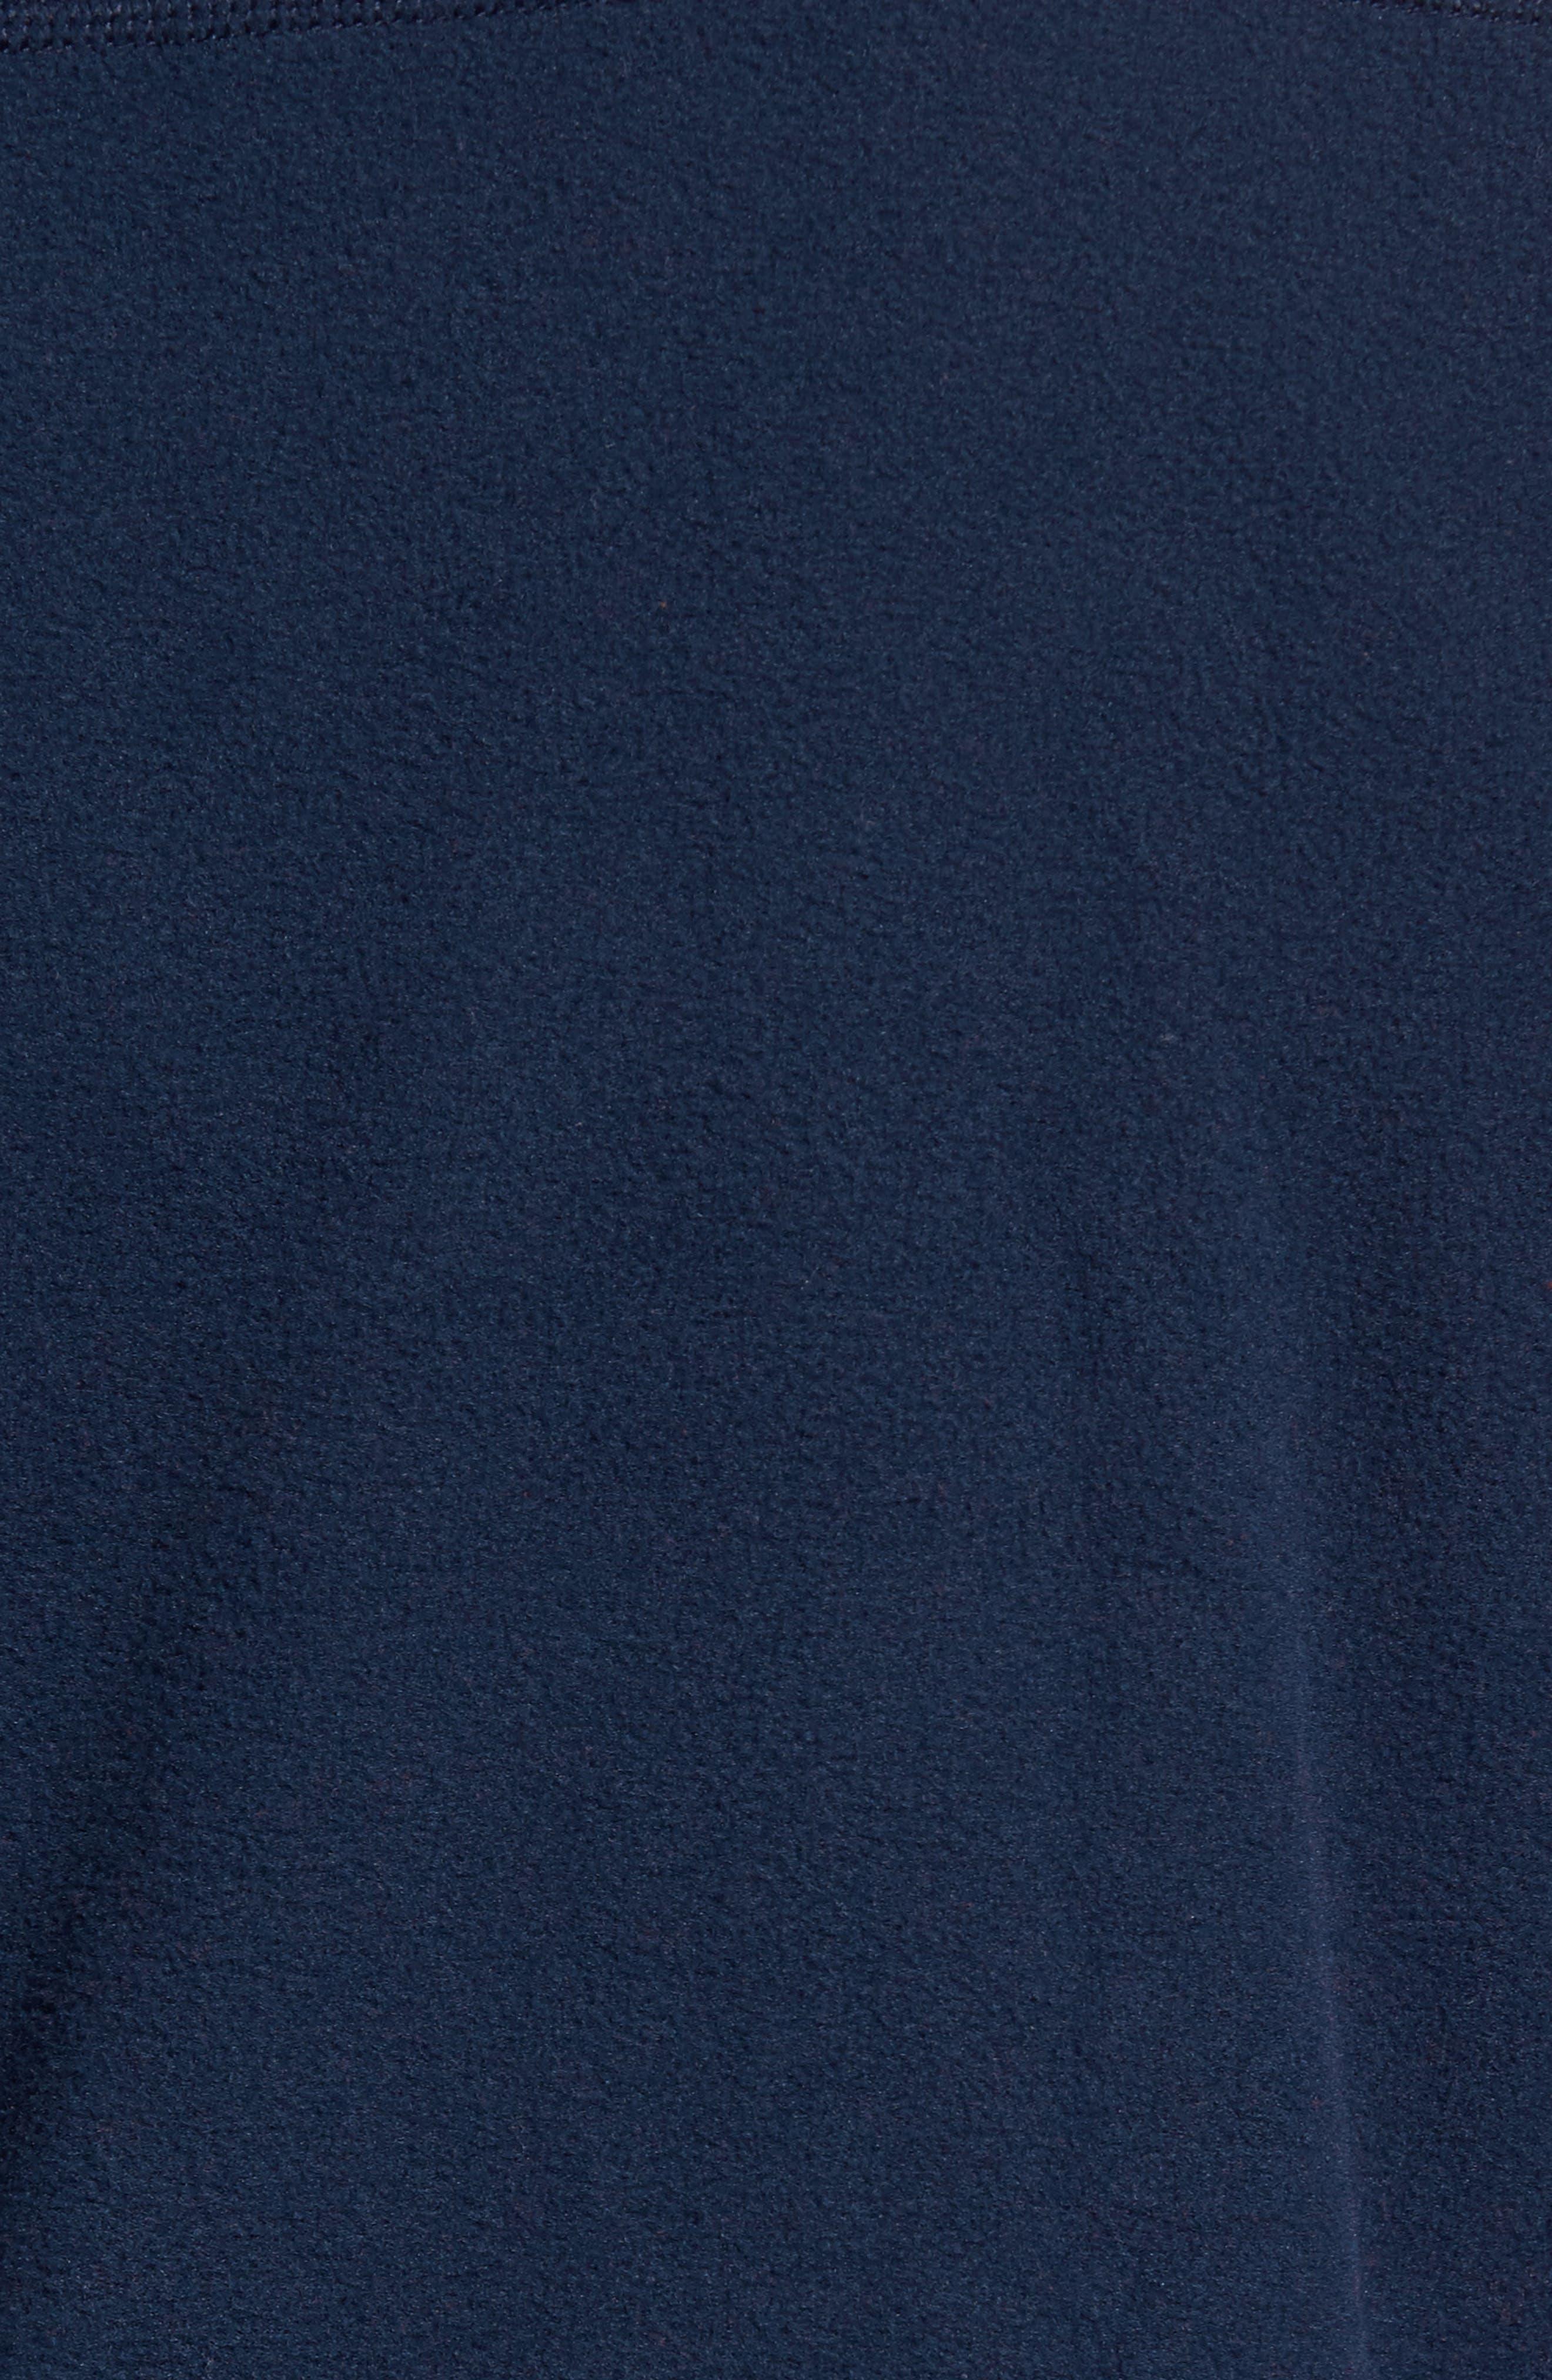 Fleece Pullover,                             Alternate thumbnail 5, color,                             BLUE